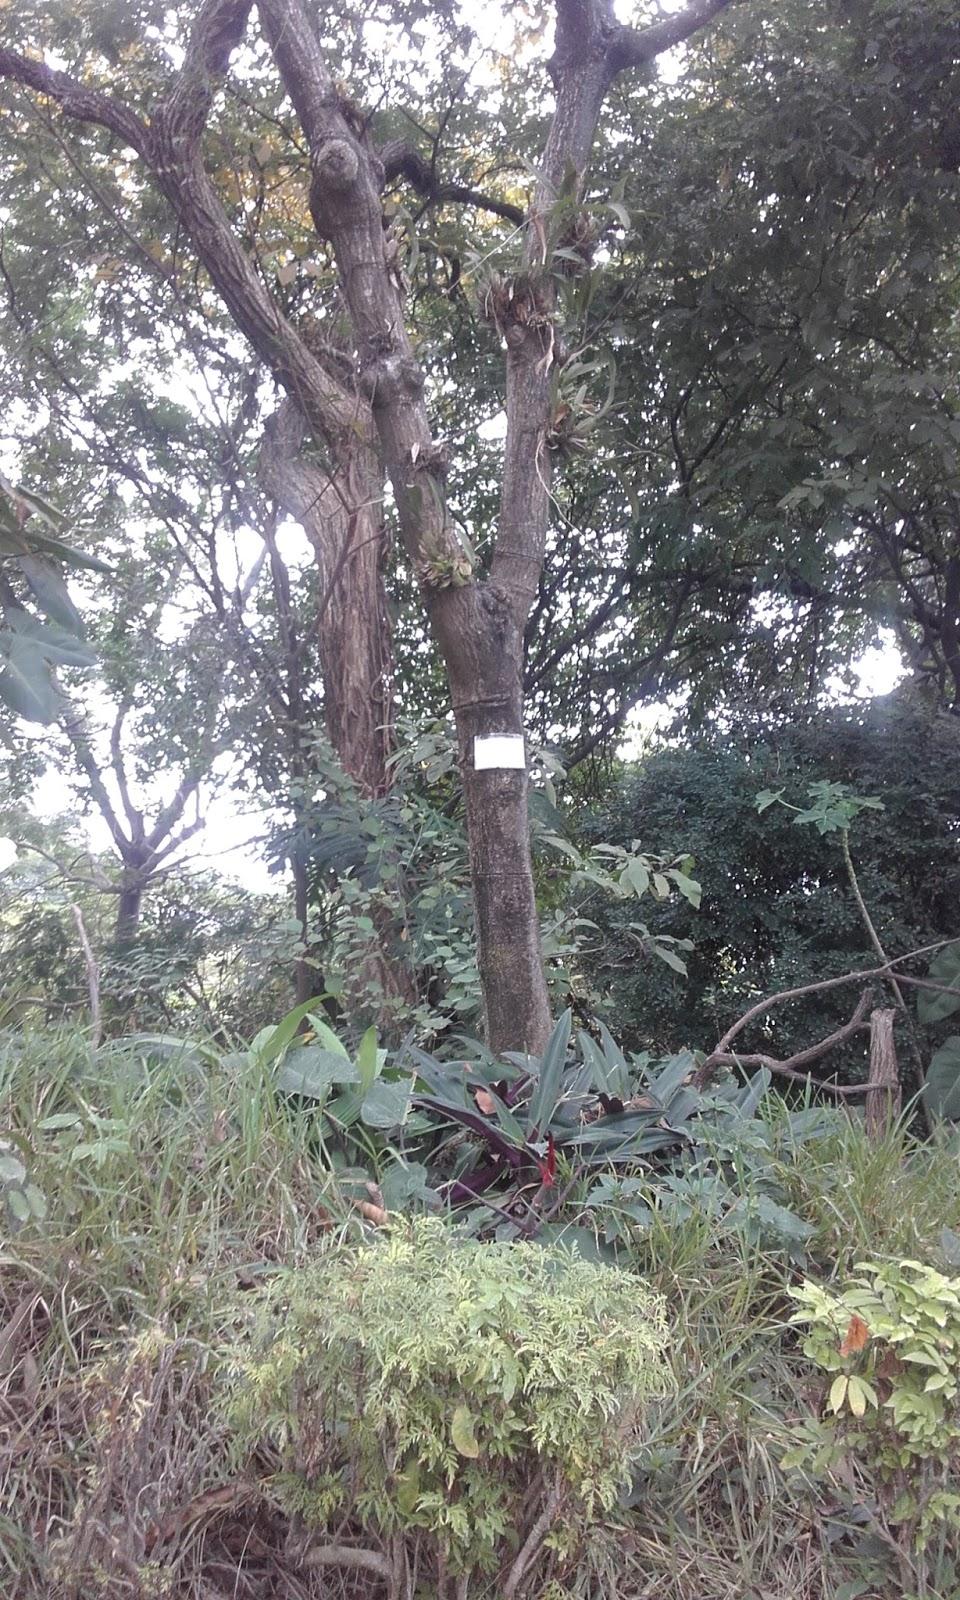 Jard n bot nico de guayaquil julio 2016 for Calendario jardin botanico 2016